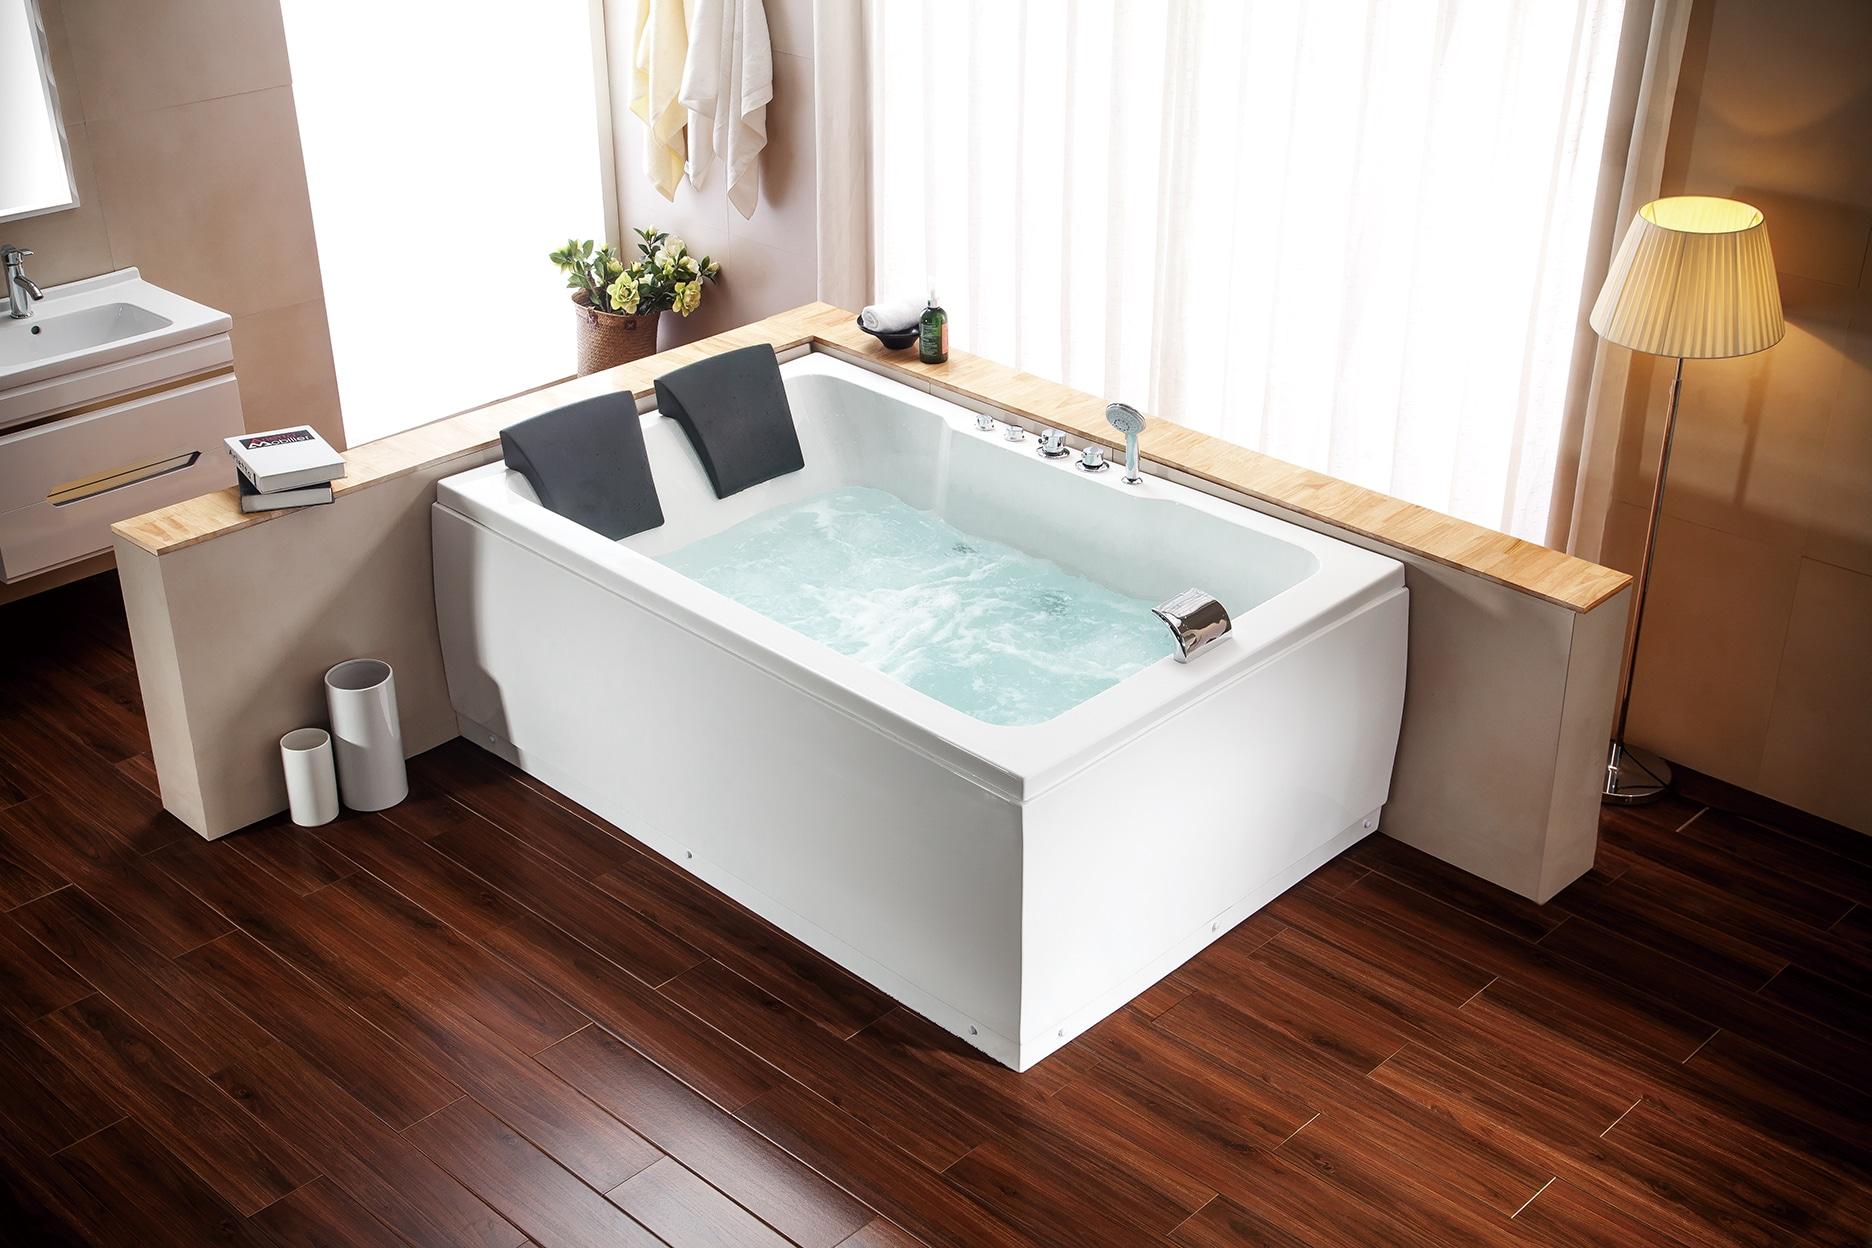 Top 100 Jacuzzi Bath Tub Dealers in Pune - Best Jacuzzi Dealers ...